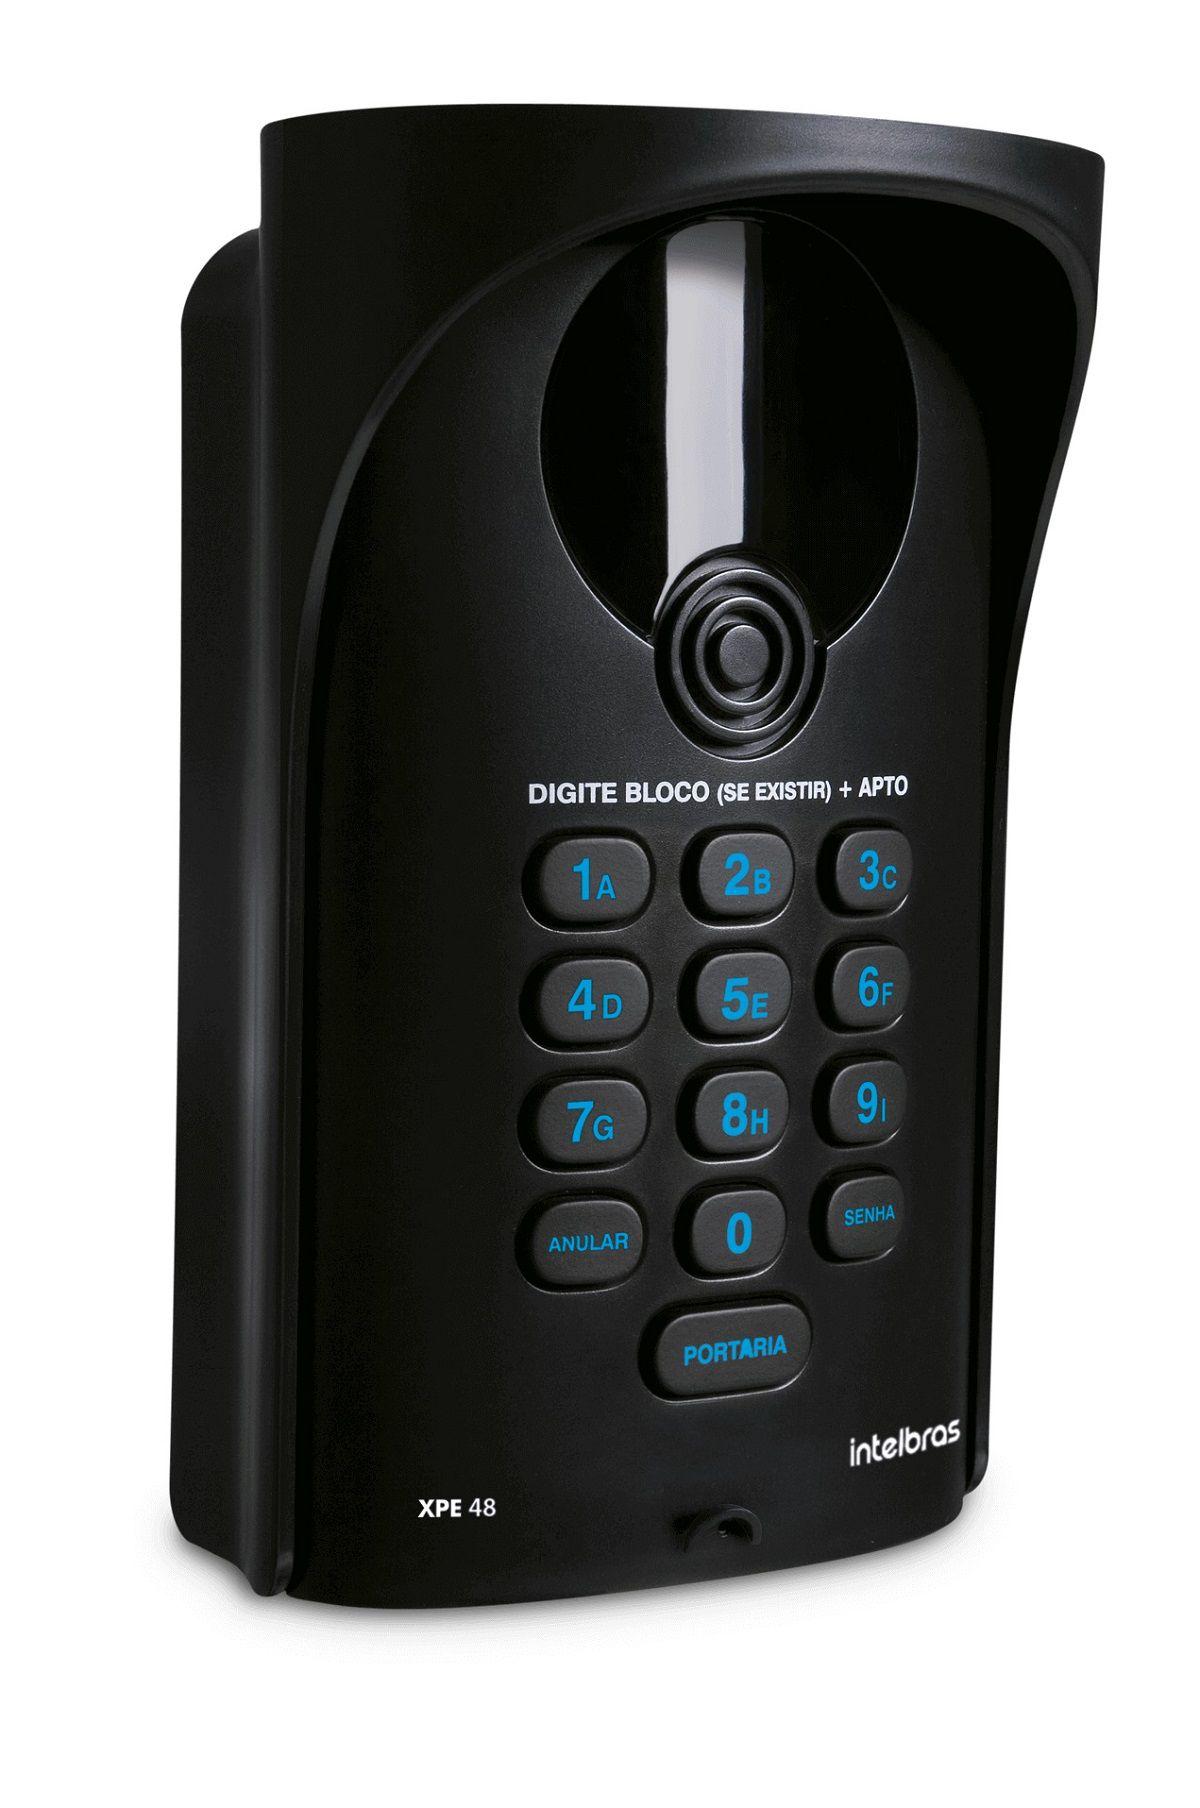 Kit Interfone Portaria Coletivo Comunic 14 Pontos Intelbras